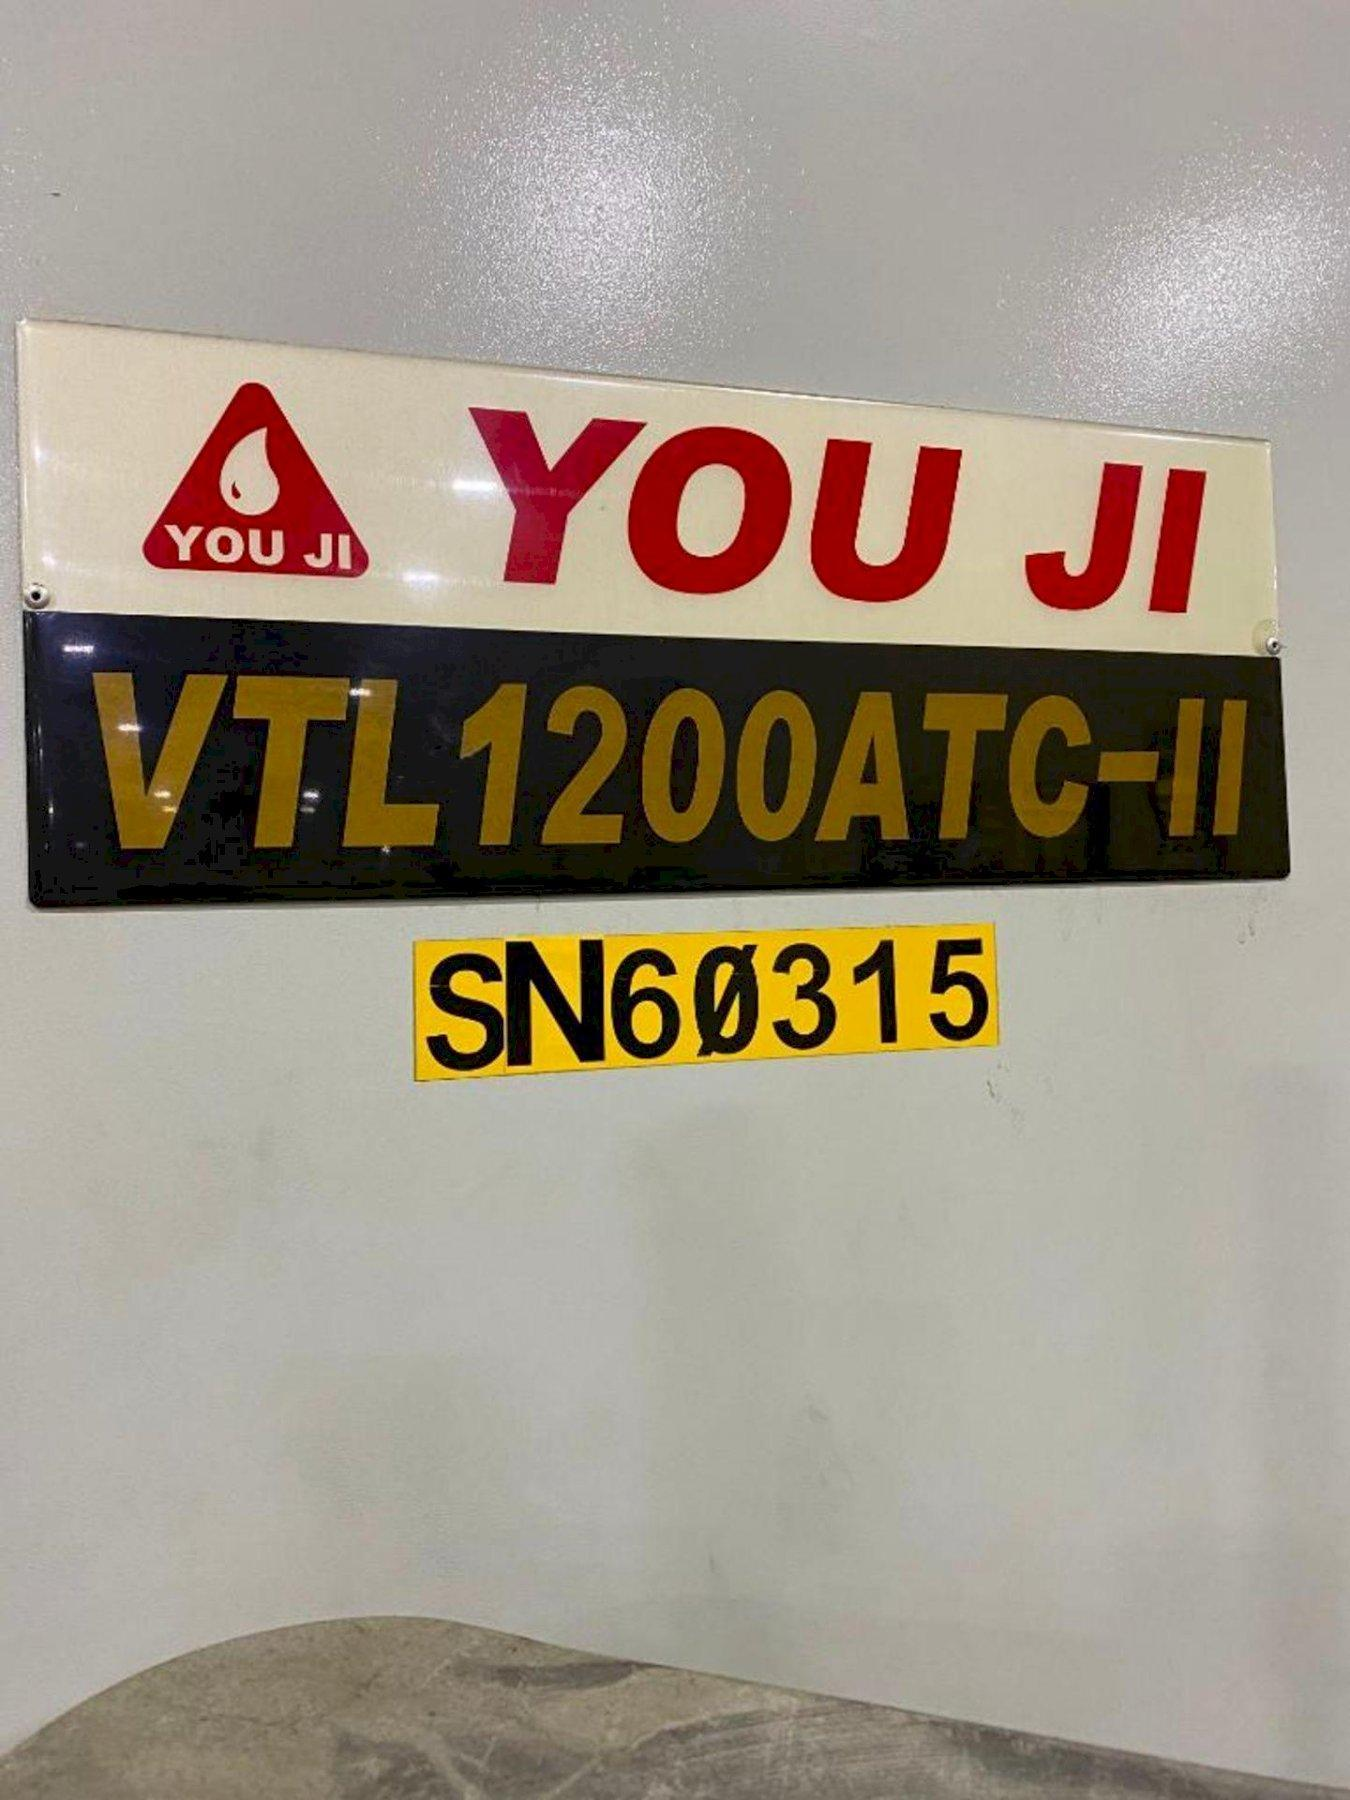 You Ji VTL1200 ATC-II CNC Vertical Lathe